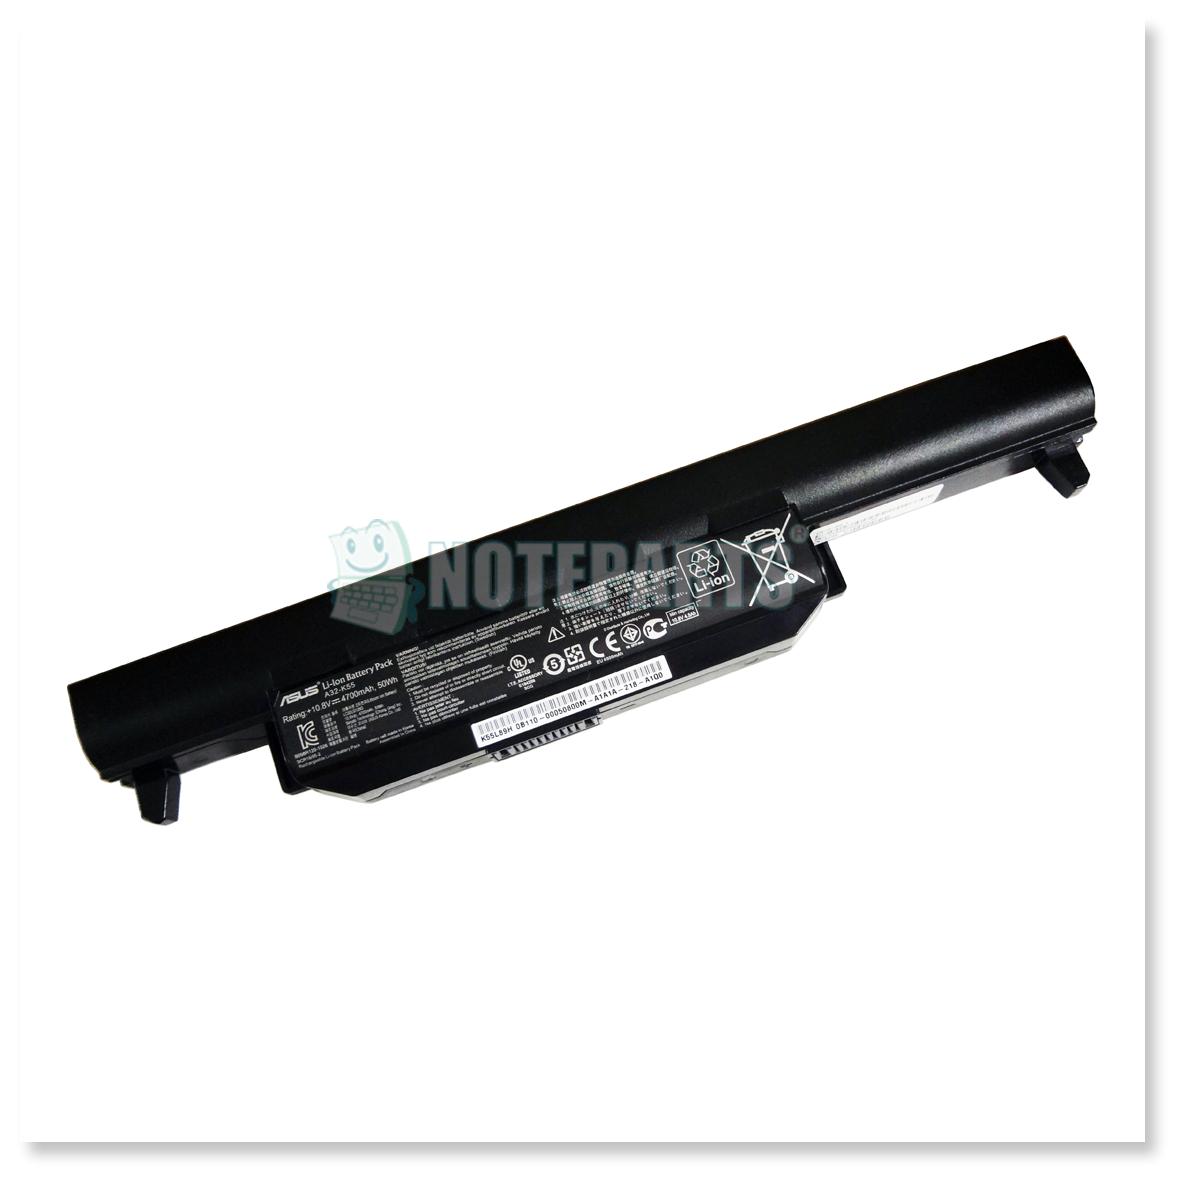 Asus純正 K55DR K55A K55VD X55U X75VD 6セル バッテリー A32-K55